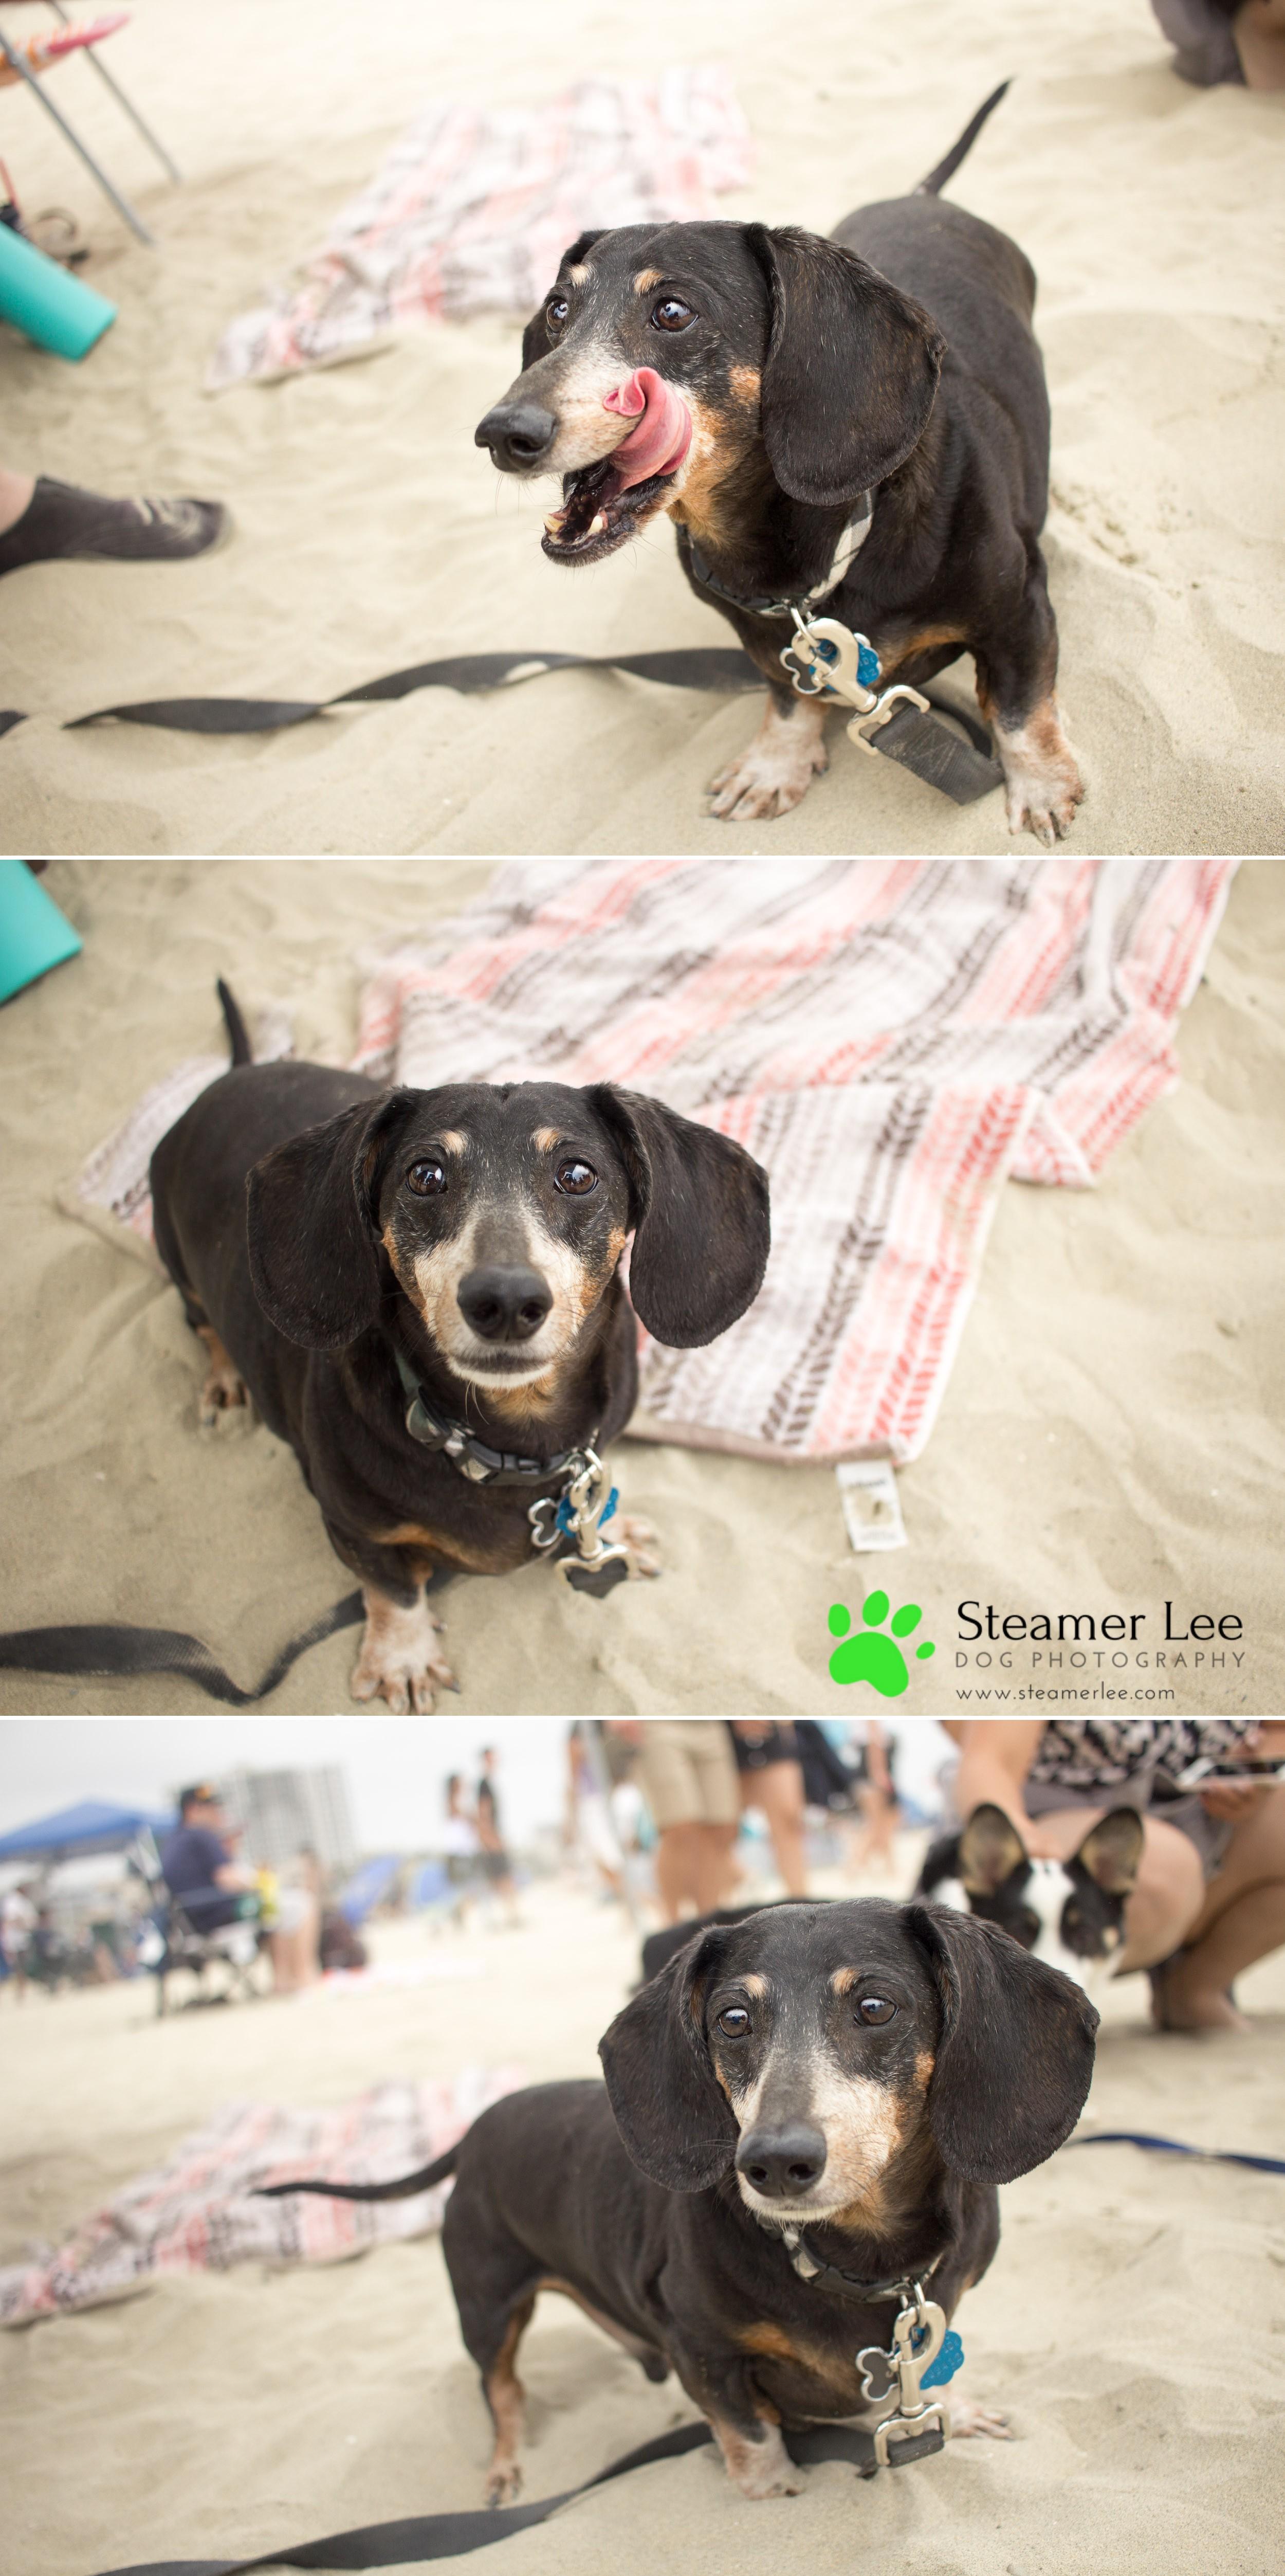 Steamer Lee Dog Photography - July 2017 So Cal Corgi Beach Day - Vol. 3 - 6.jpg